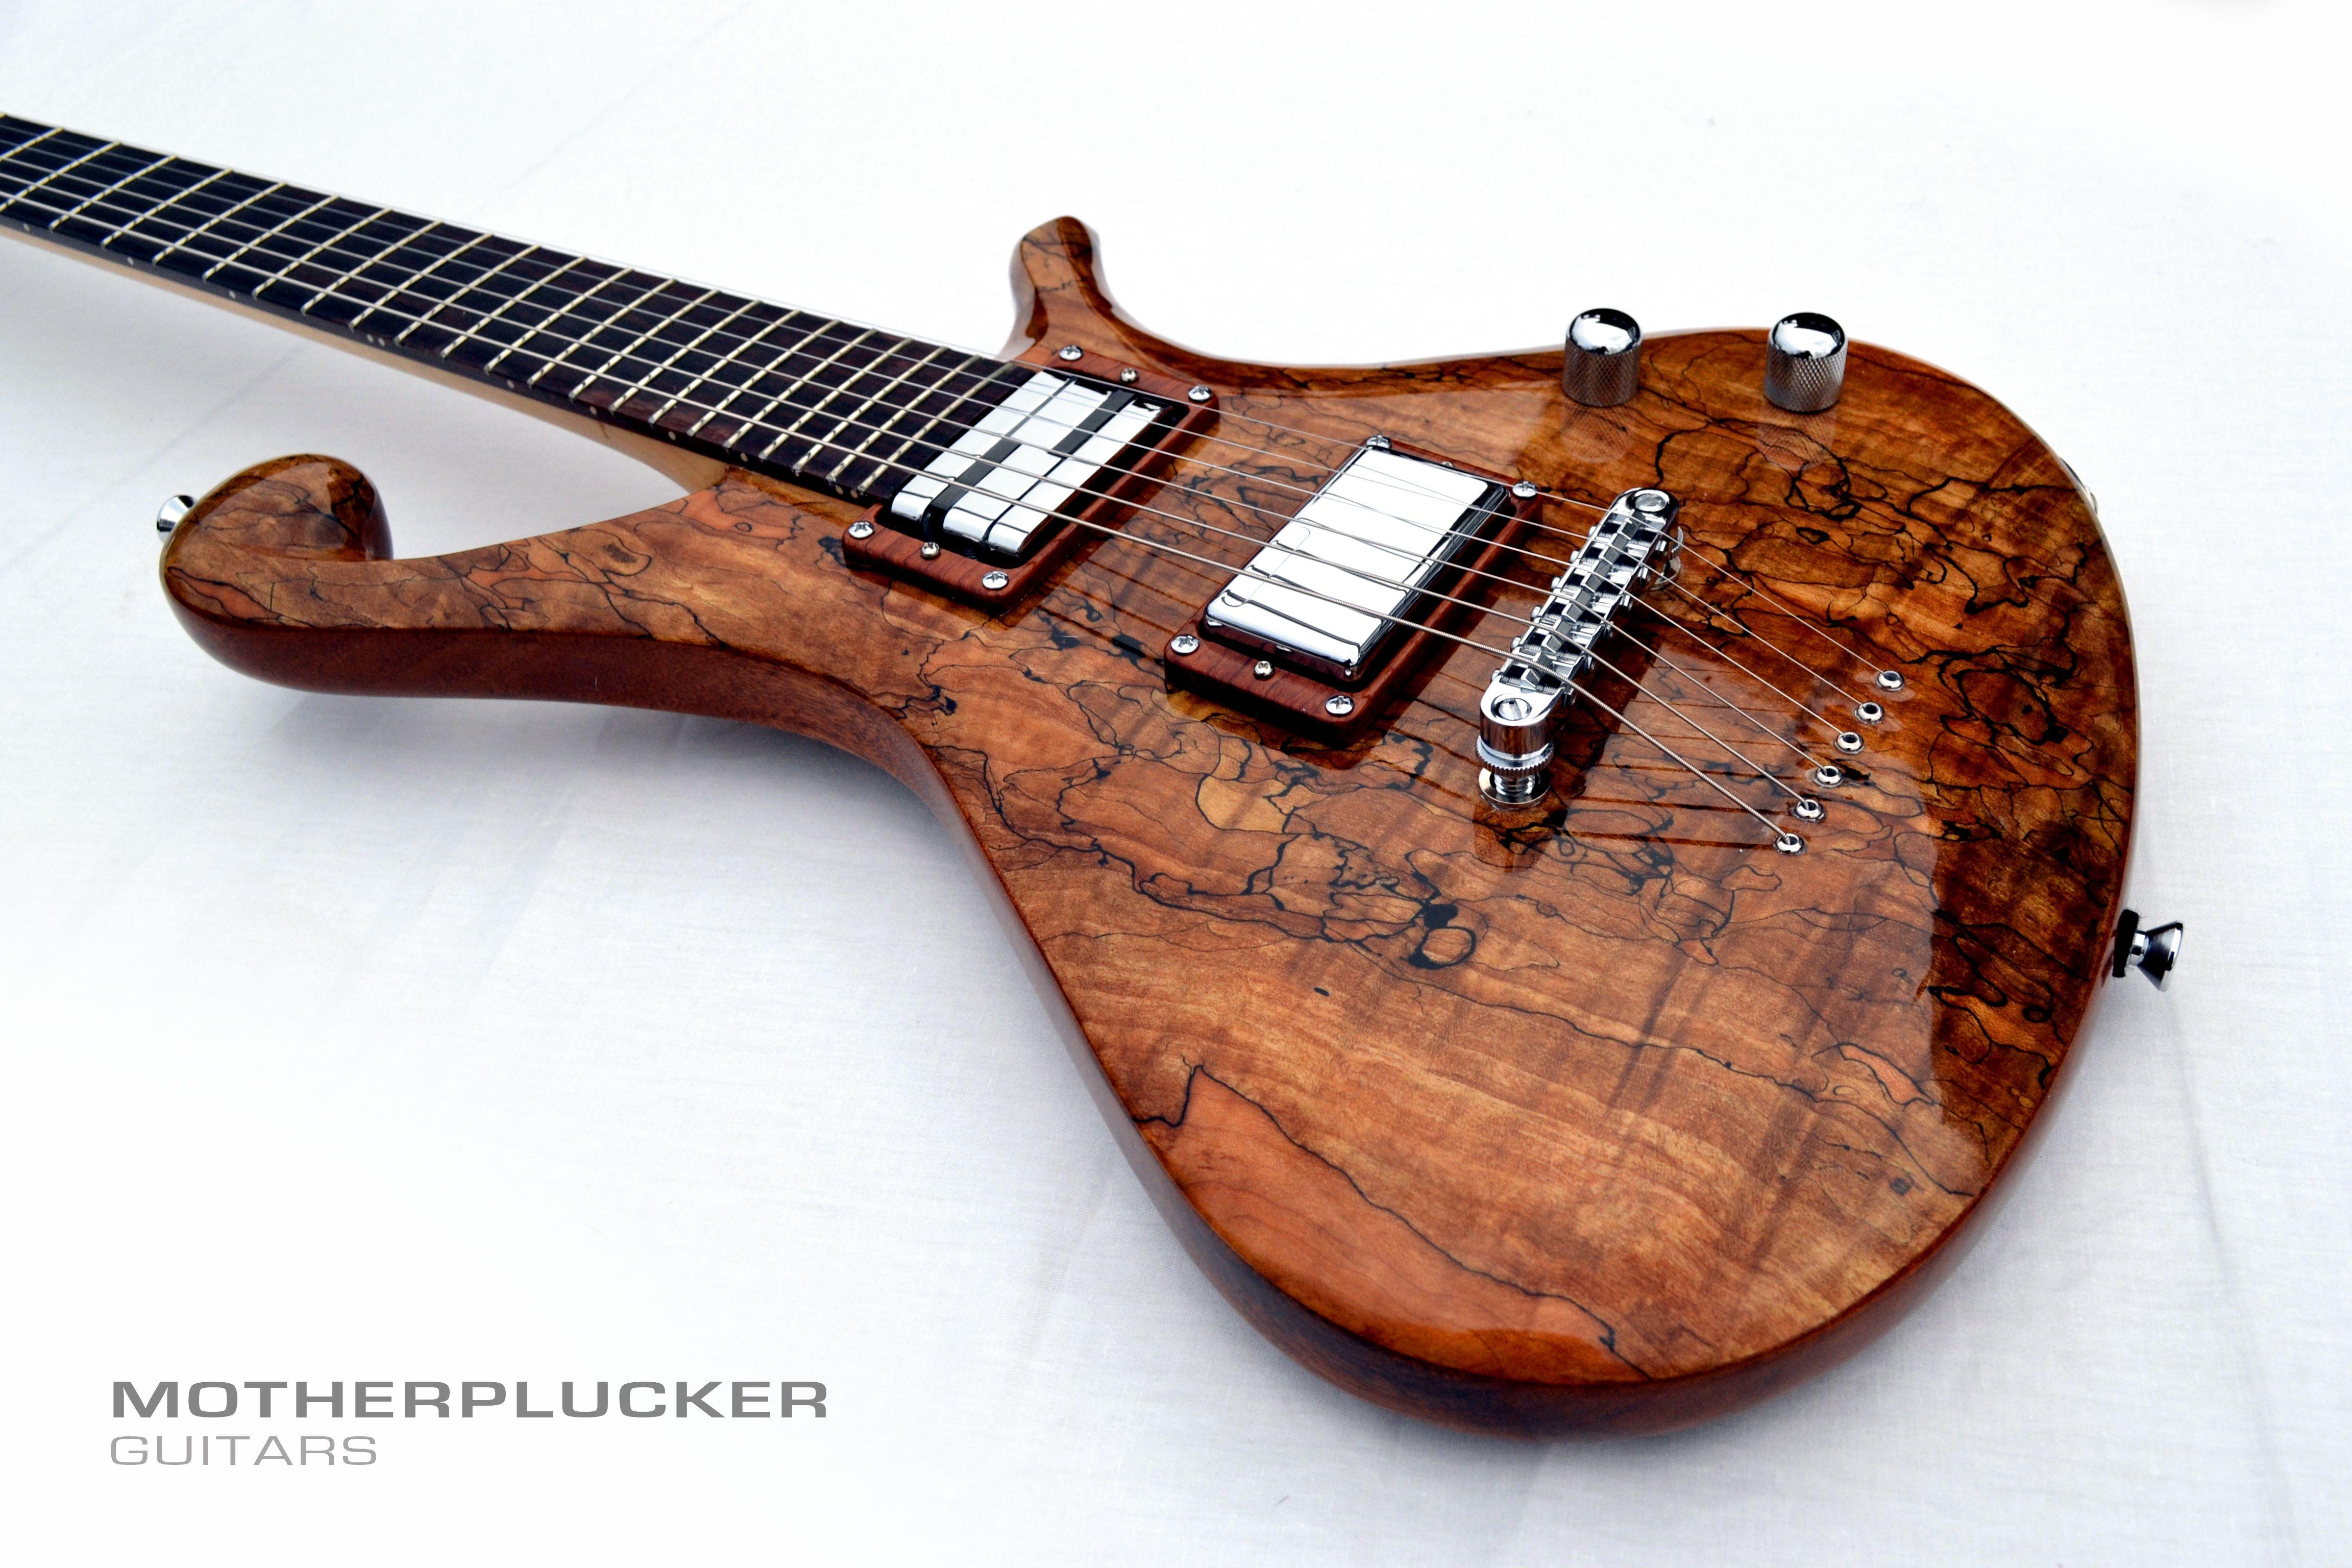 Motherplucker Guitars - Luna - 2015 http://motherpluckerguitars.com/